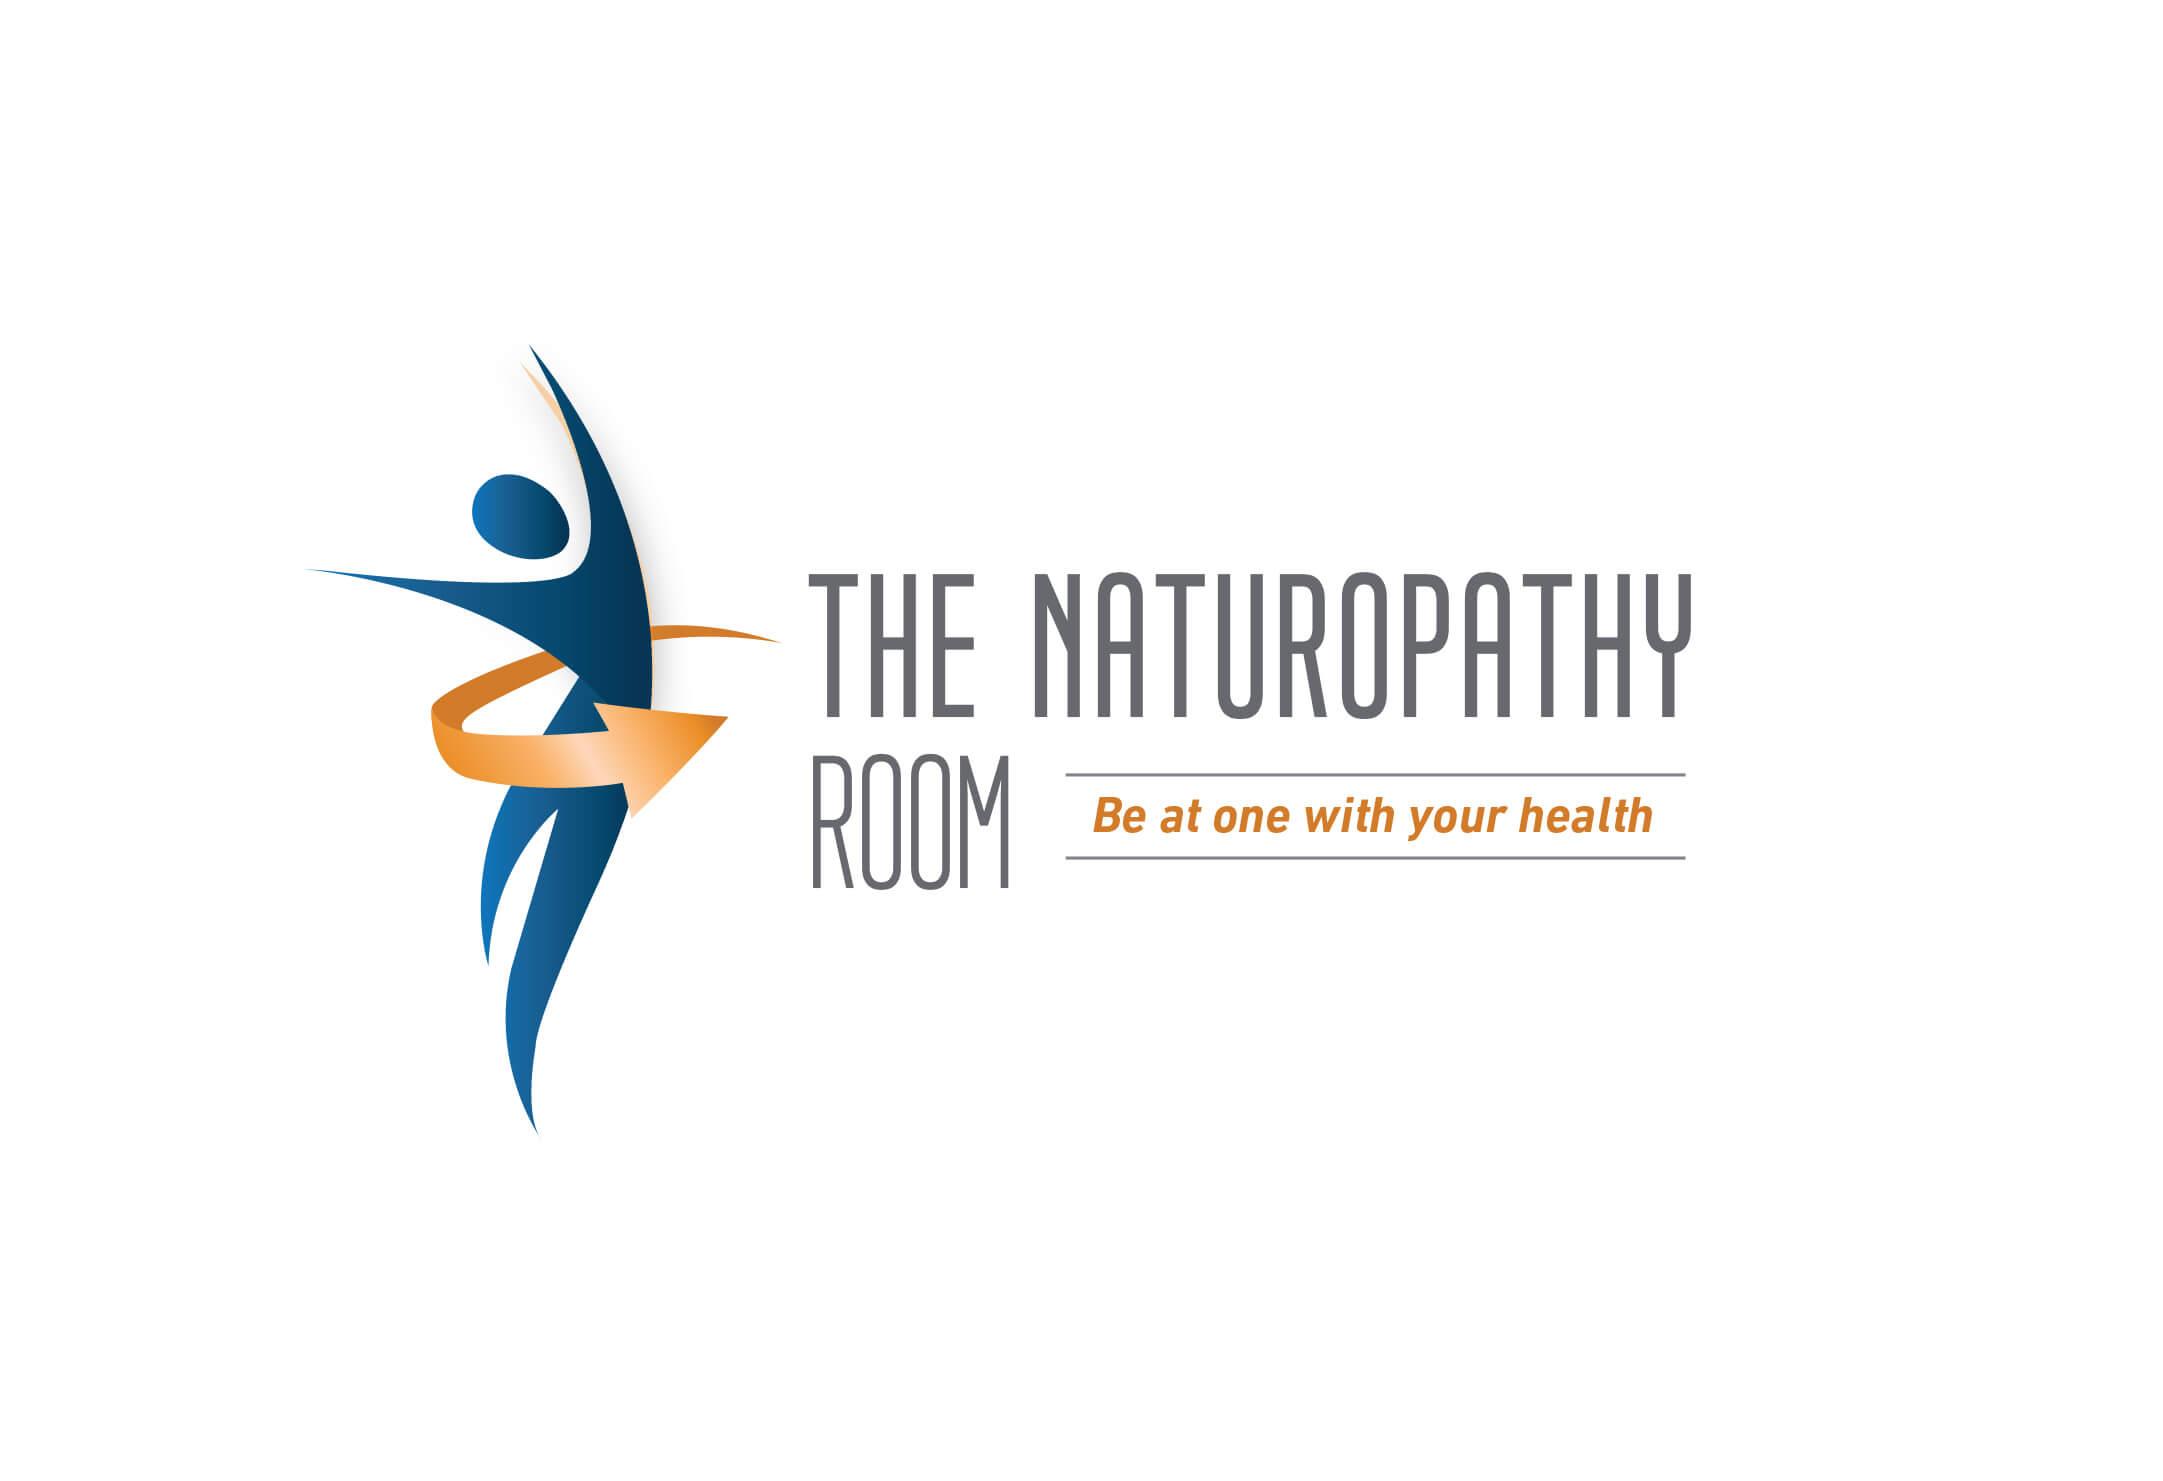 The NATUROPATHY logo